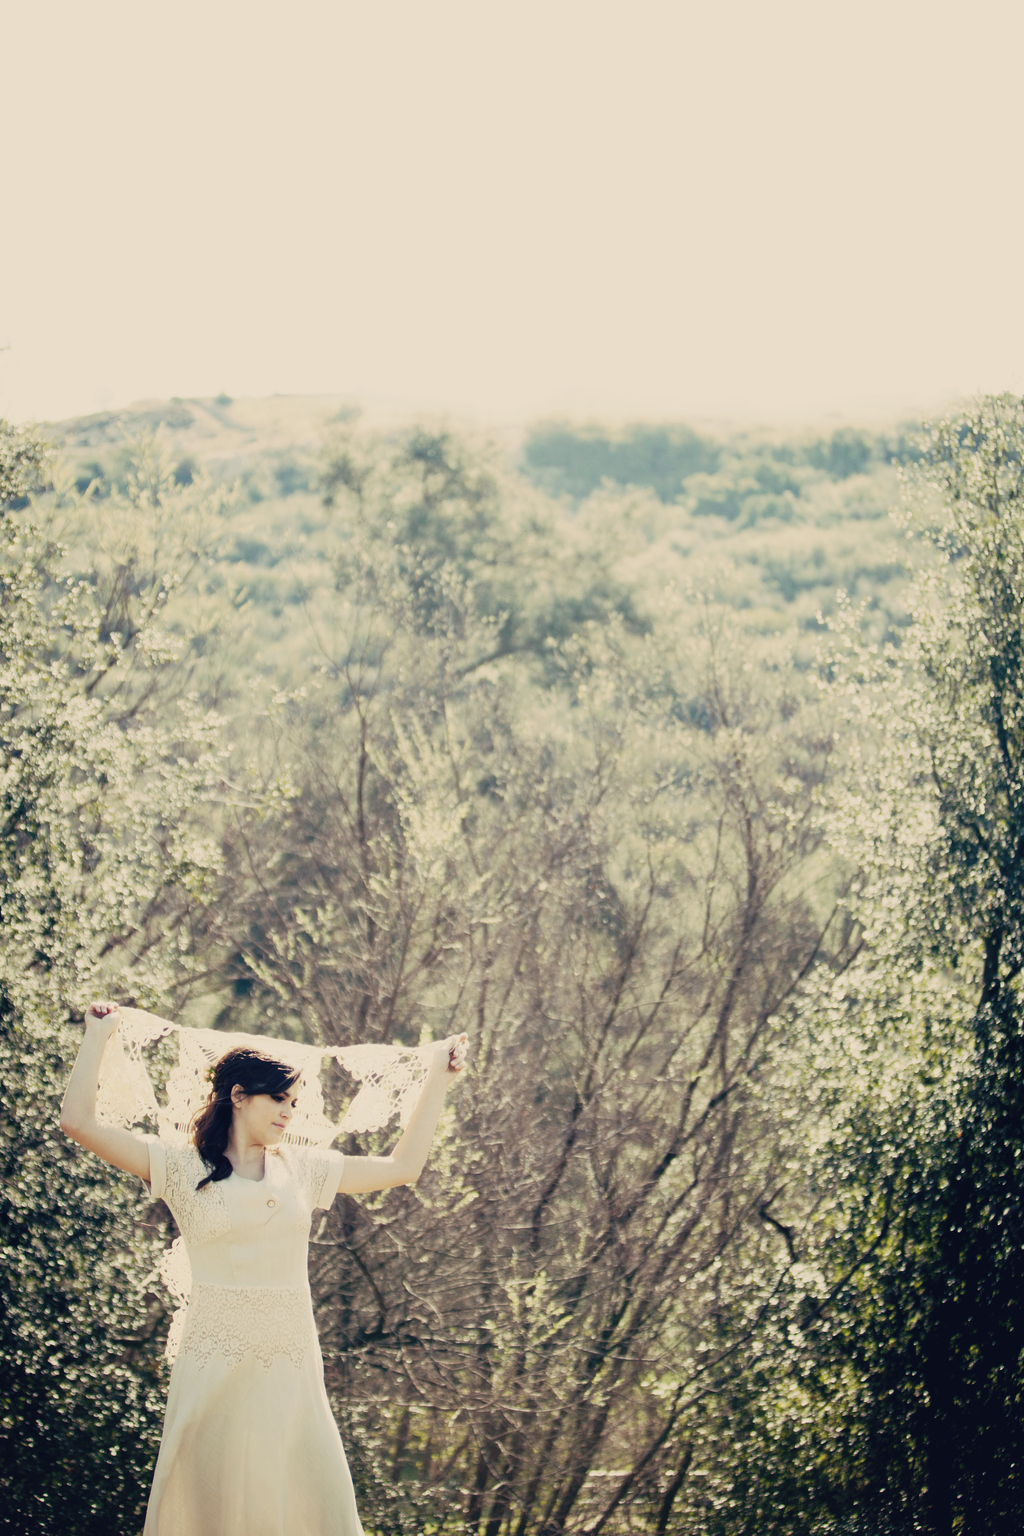 Rustic-love-outdoor-wedding-shoot.full